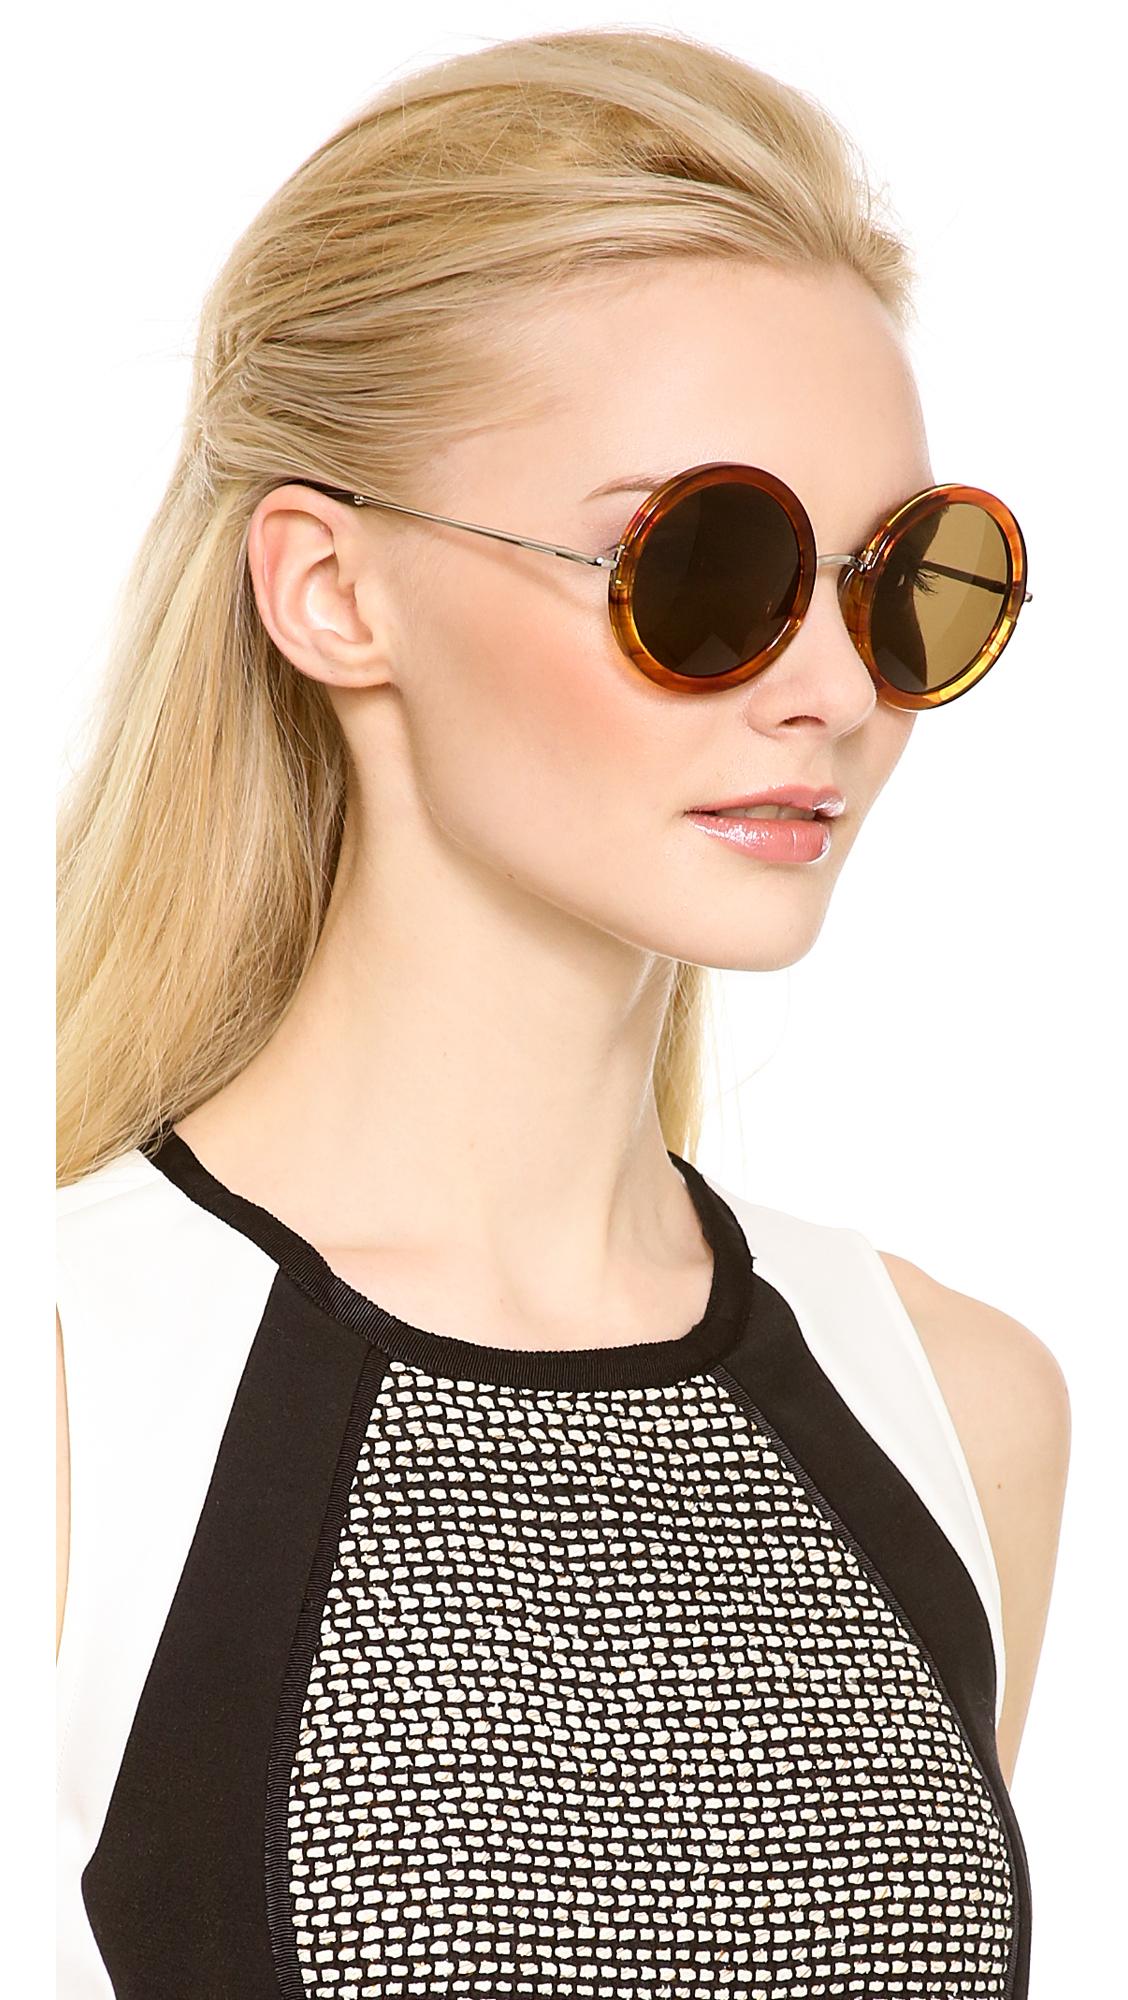 Lyst The Row Round Glam Sunglasses in Metallic